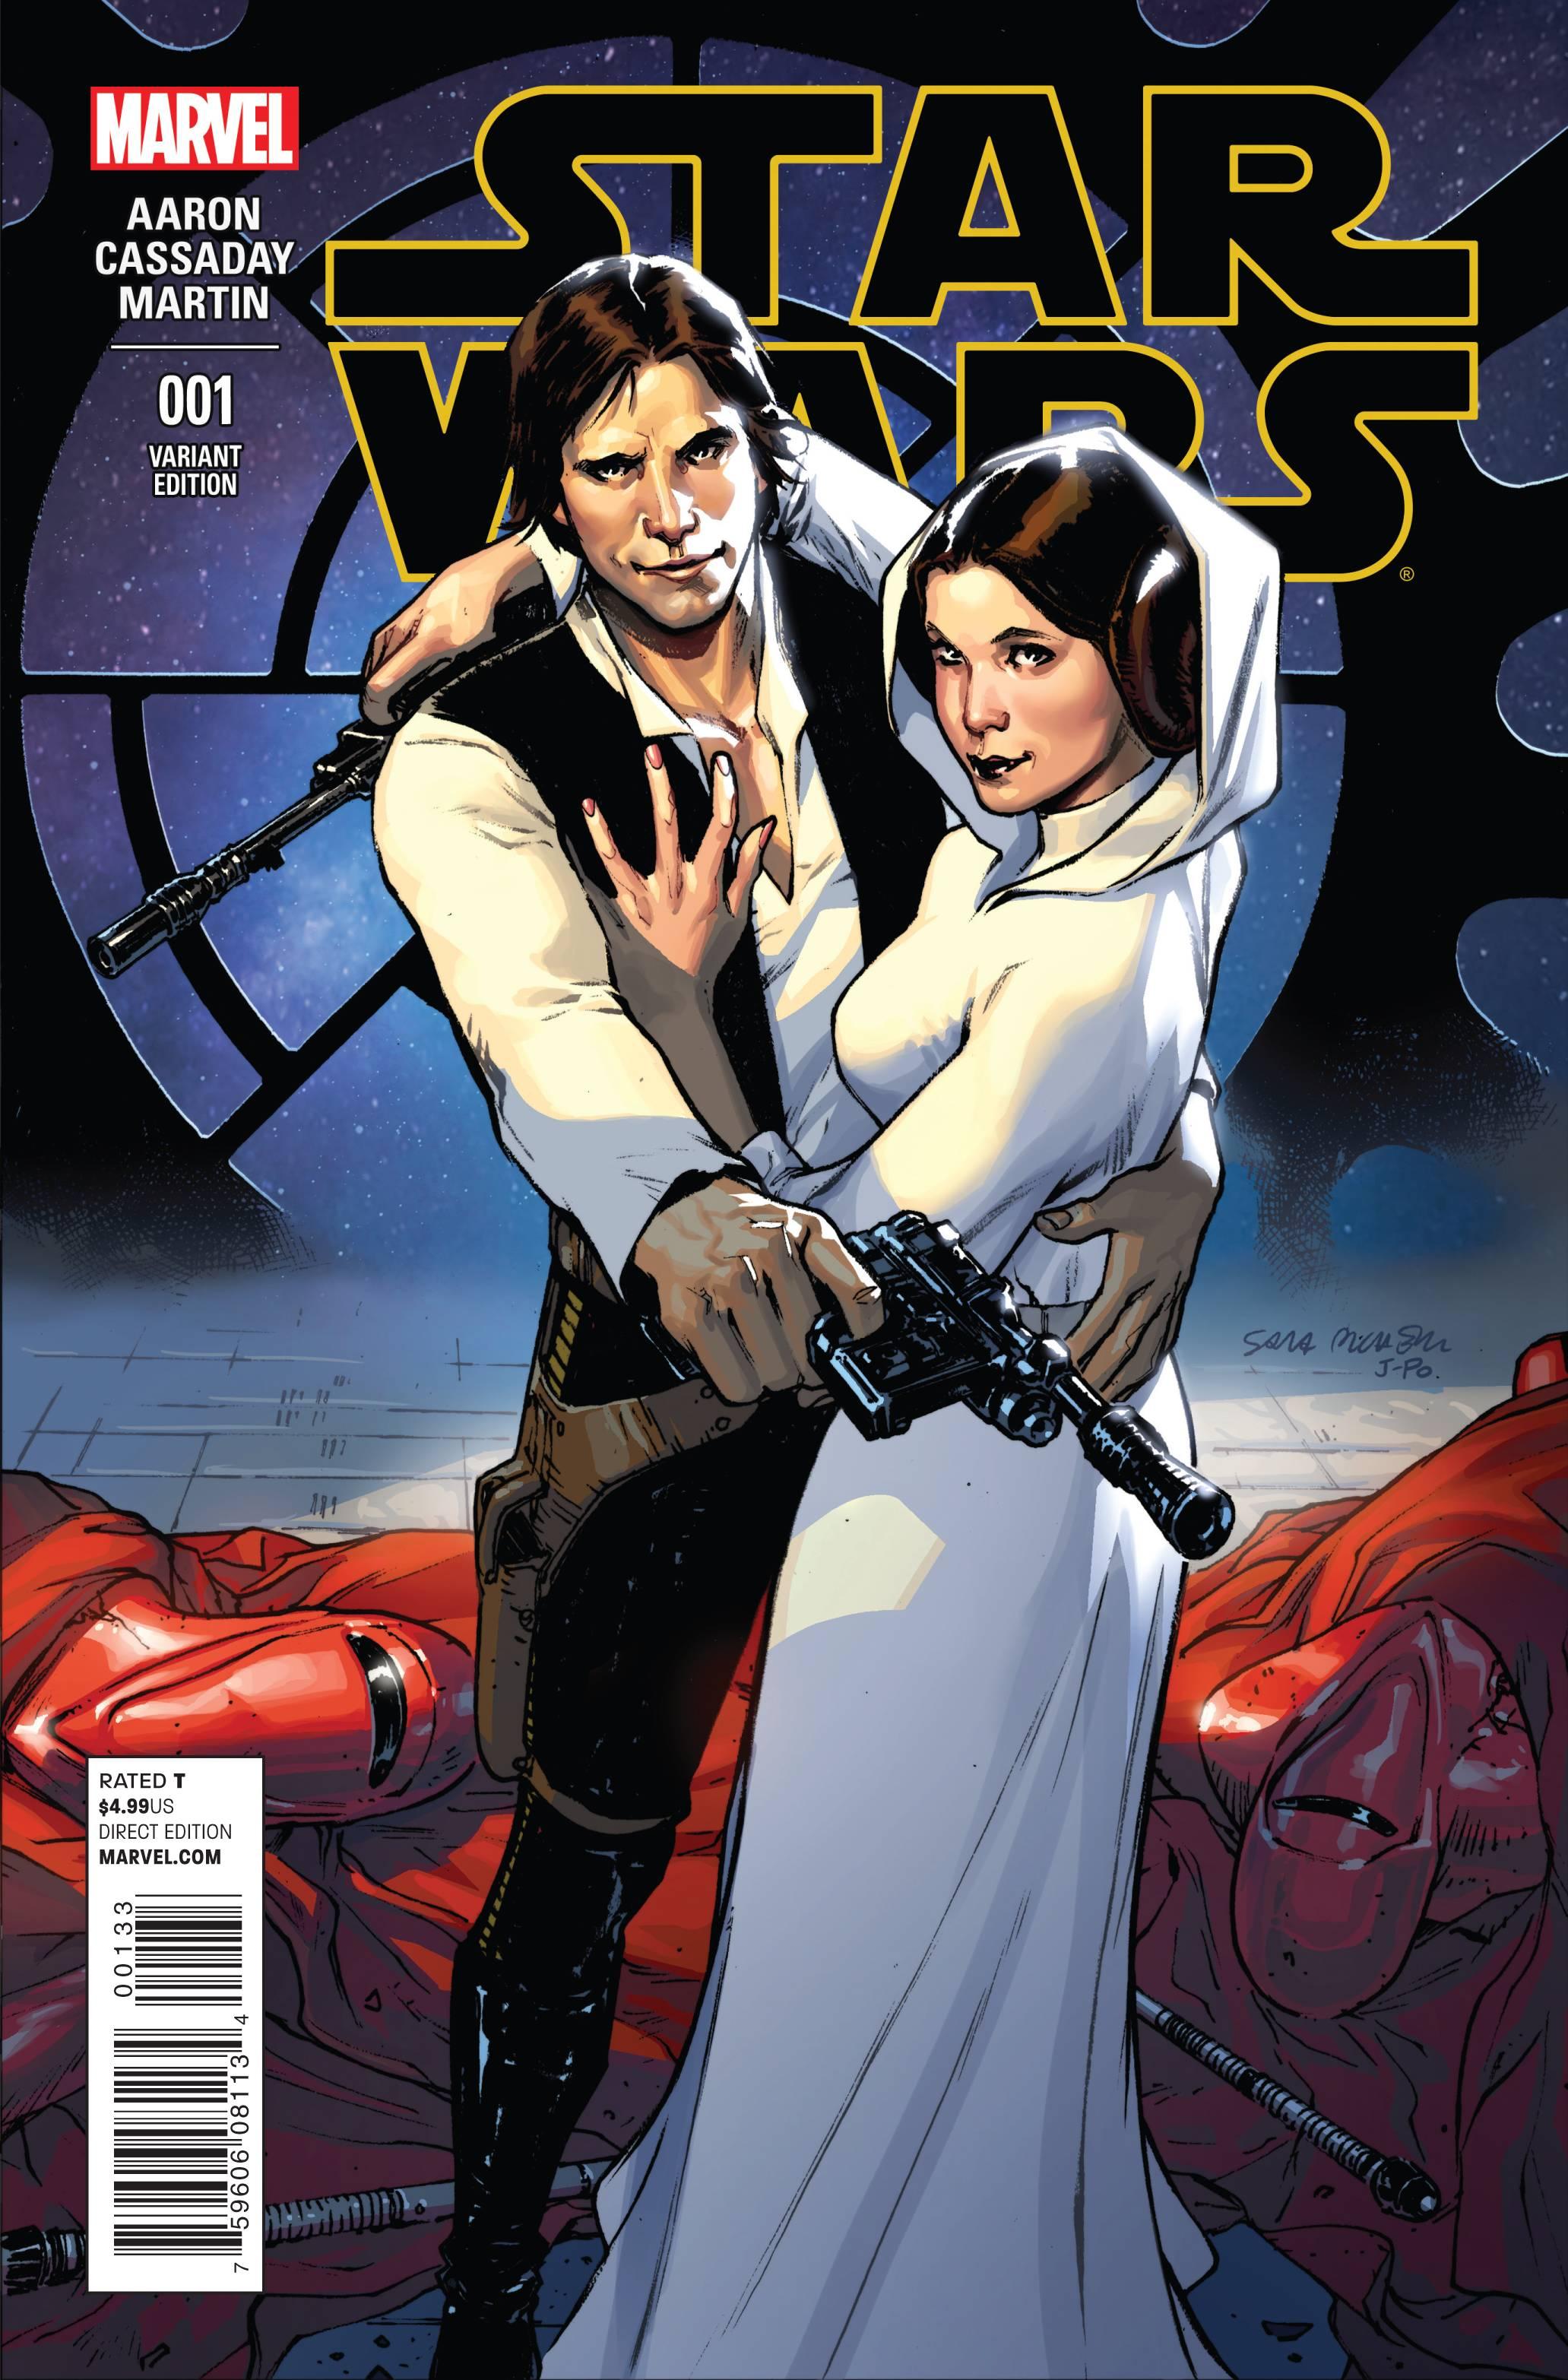 Star Wars #1 (Sara Pichelli Variant Cover) (14.01.2015)